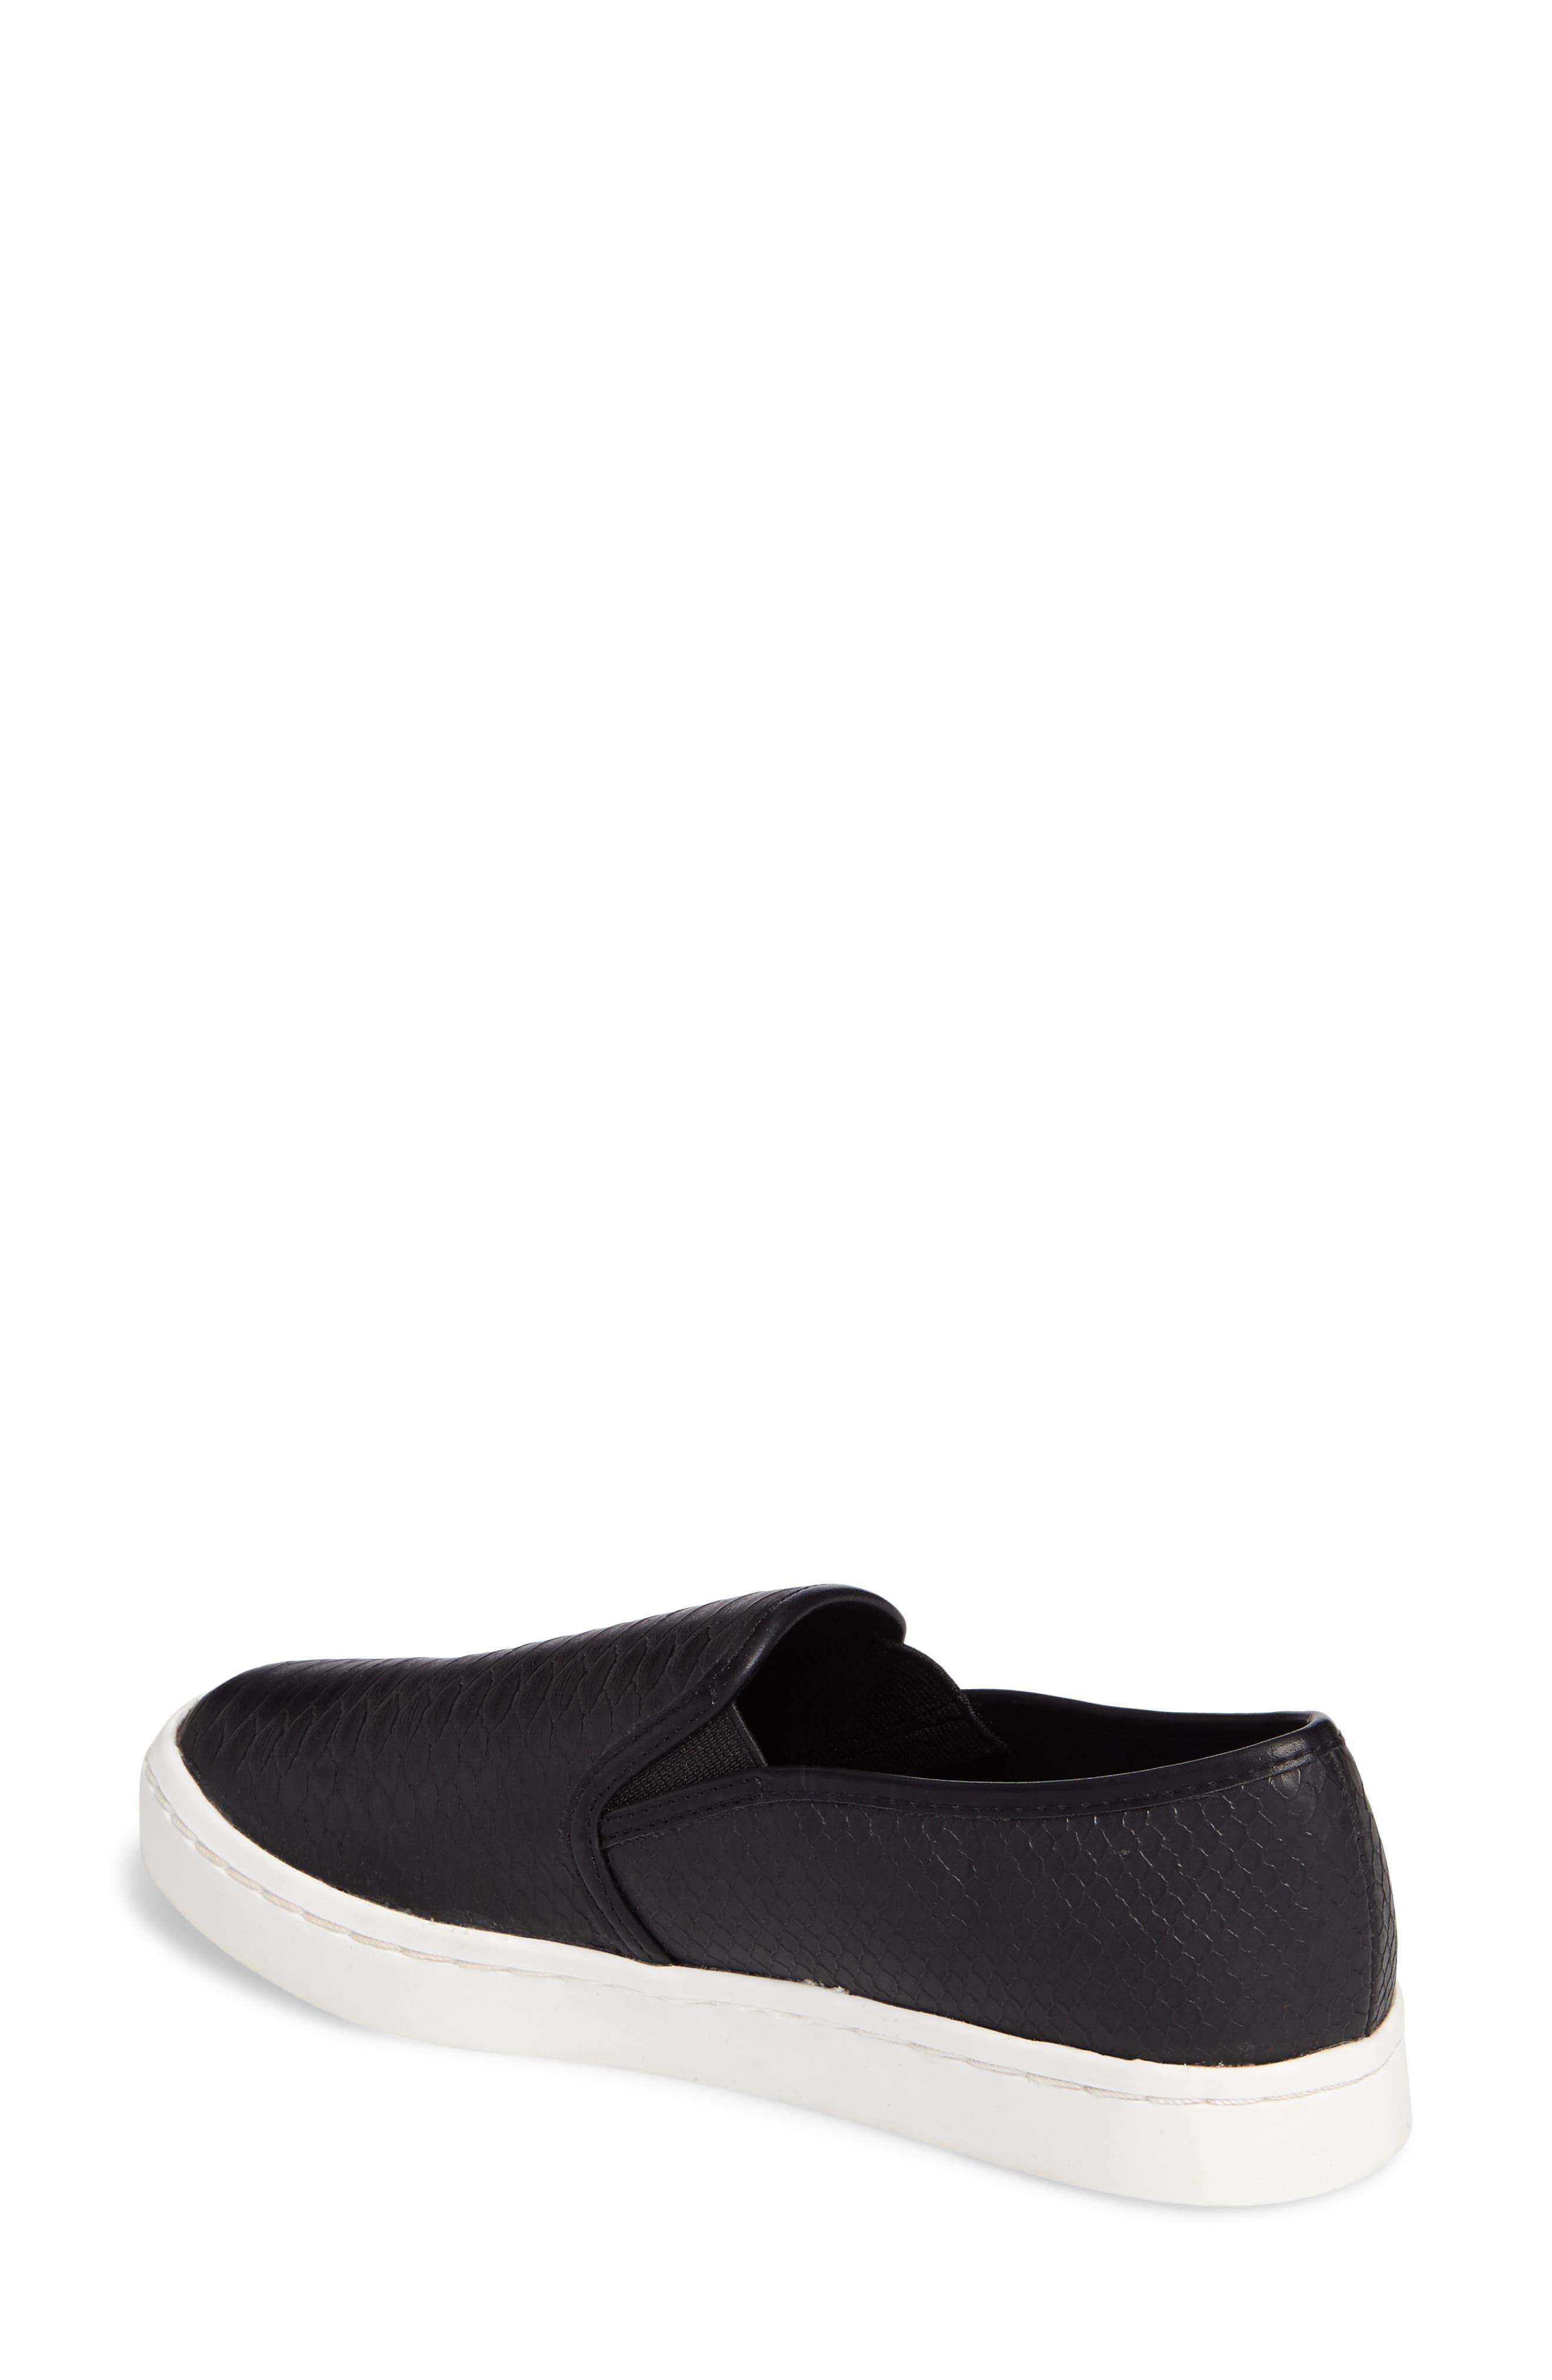 'Twiny' Slip-On Sneaker,                             Alternate thumbnail 2, color,                             005